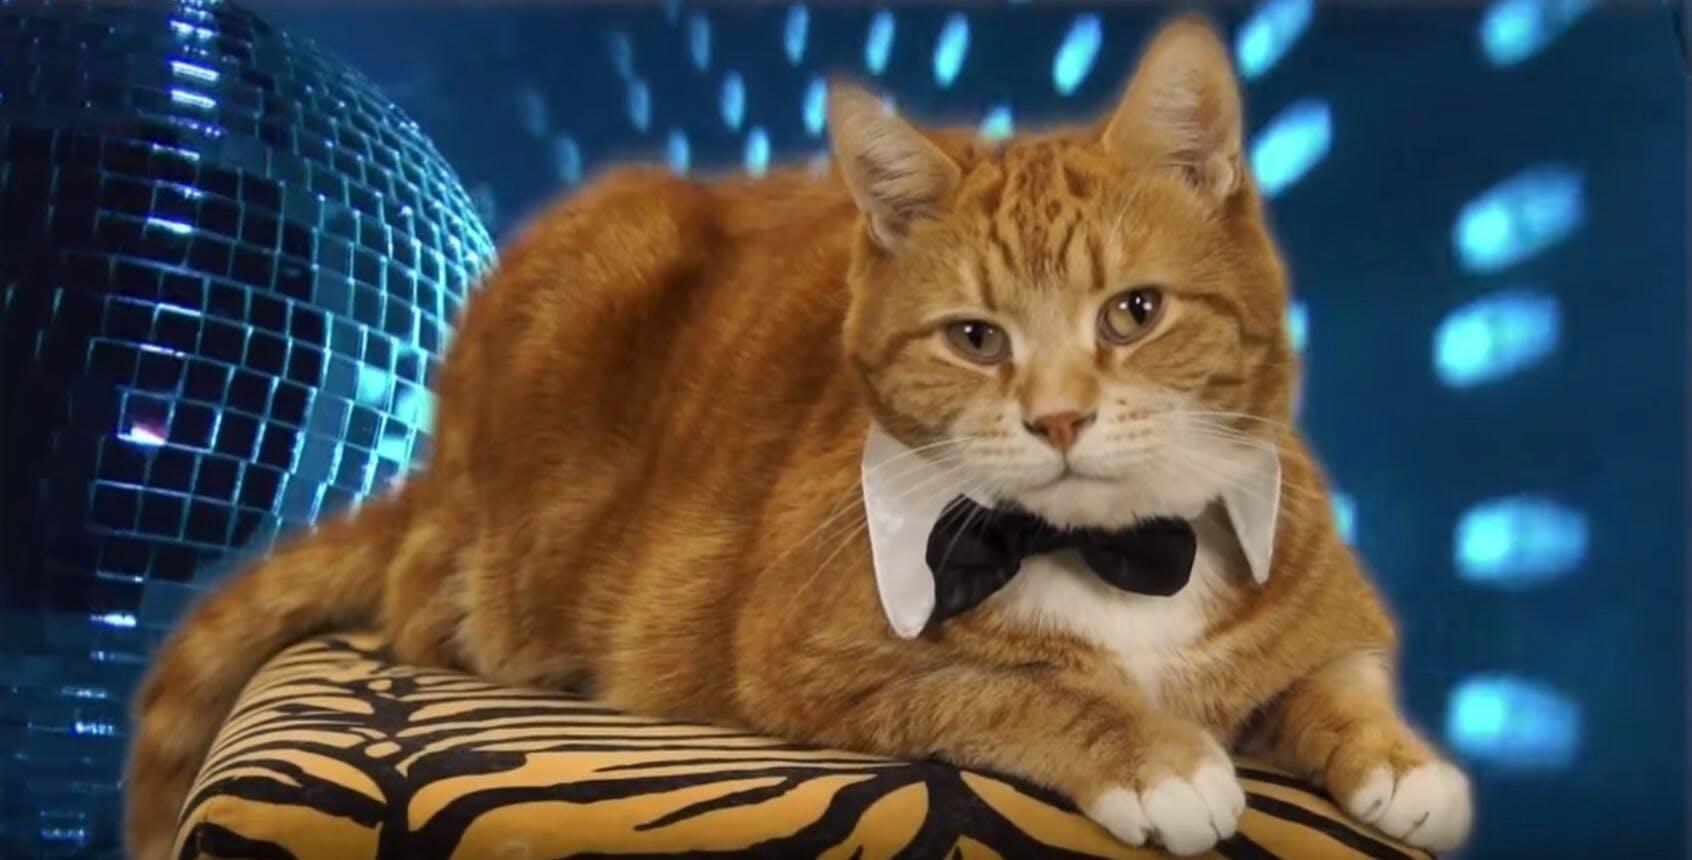 keyboard cat tribute video